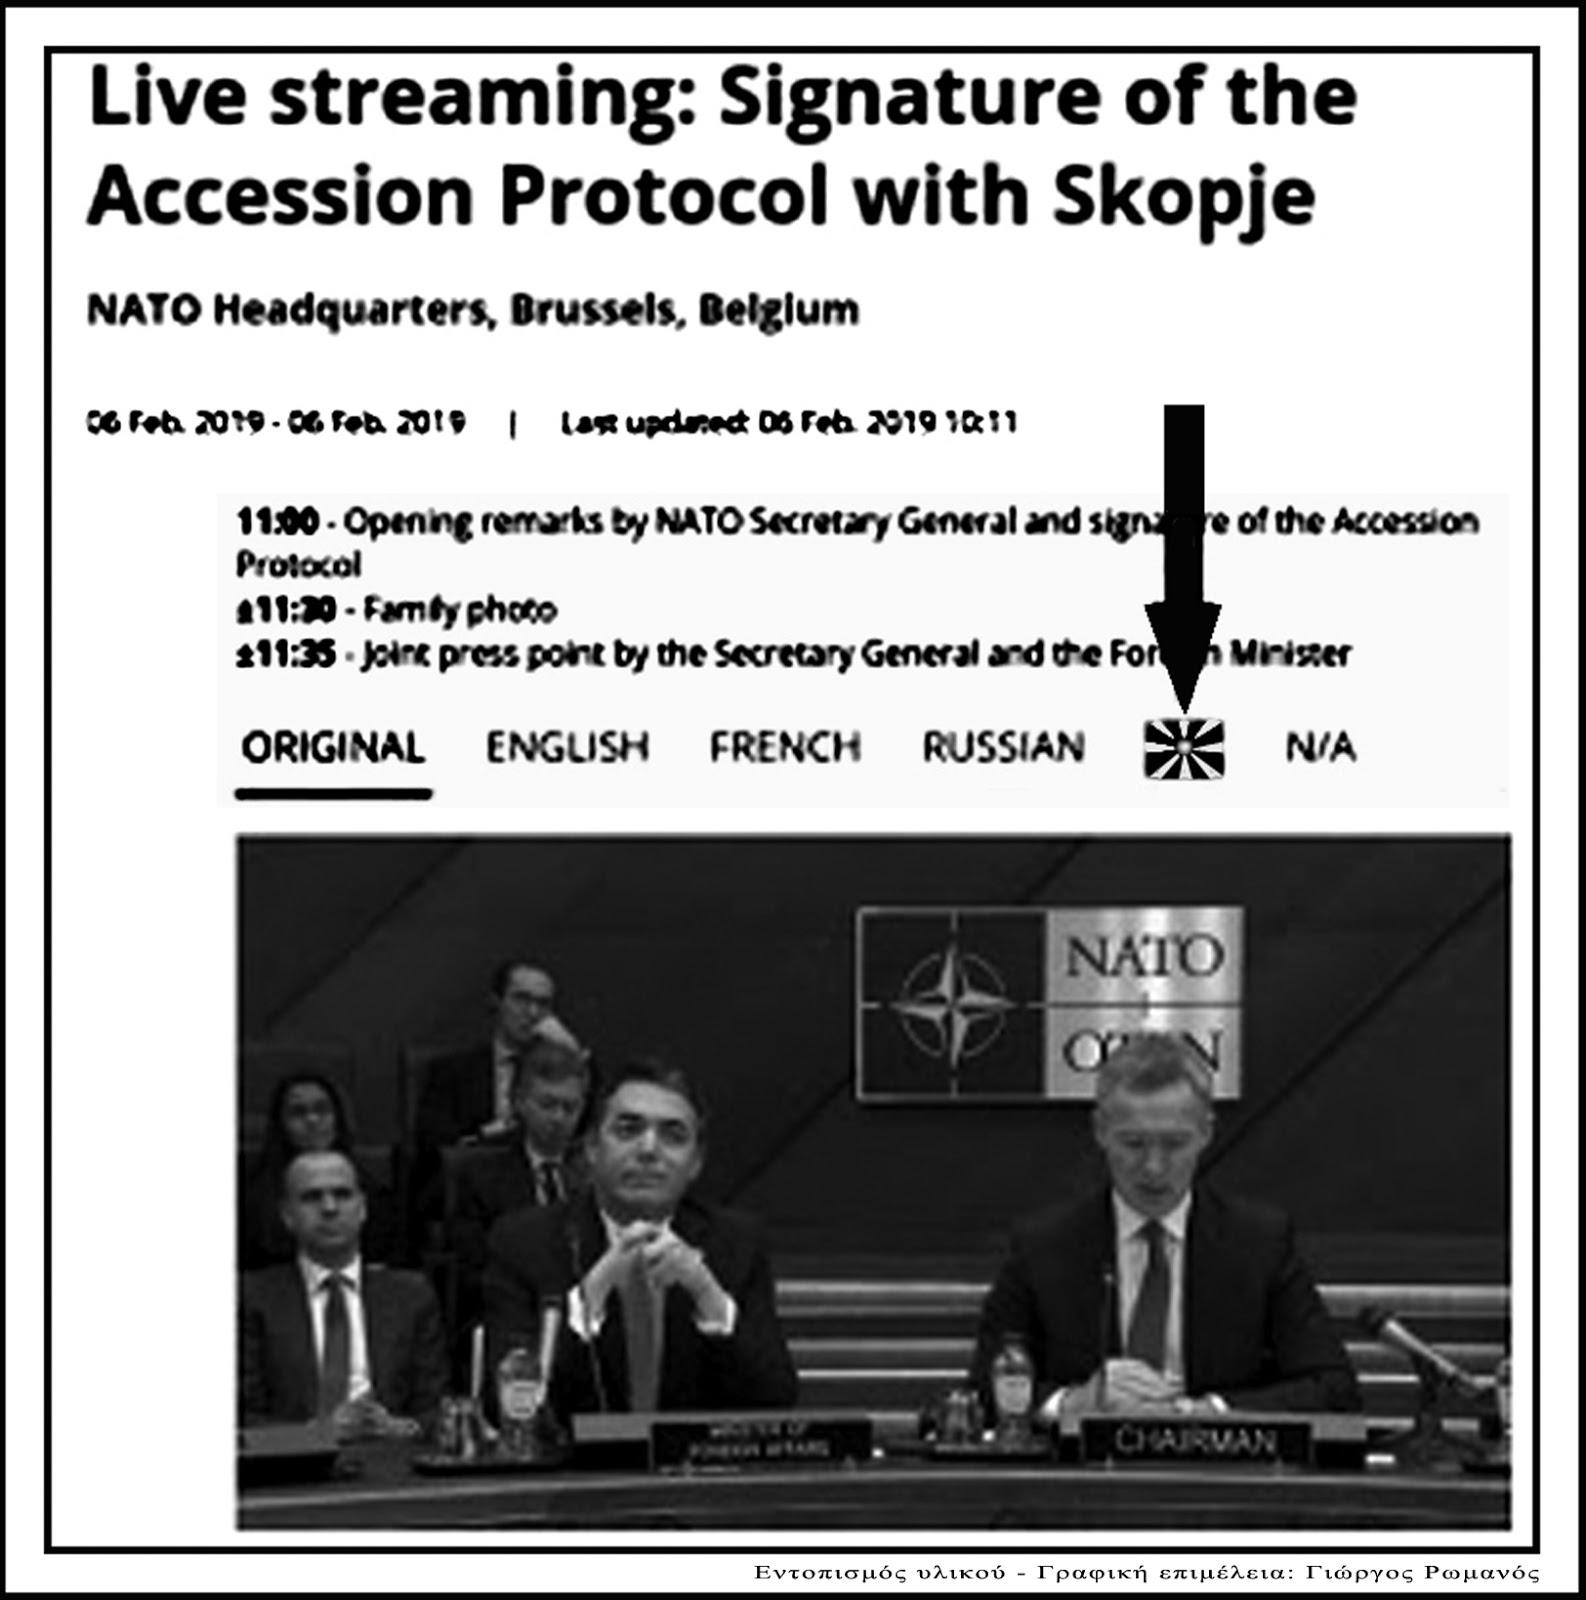 672784da474 Η μεγάλη απάτη στον ΟΗΕ, με την «Συμφωνία των Πρεσπών» - Η διμερής ...